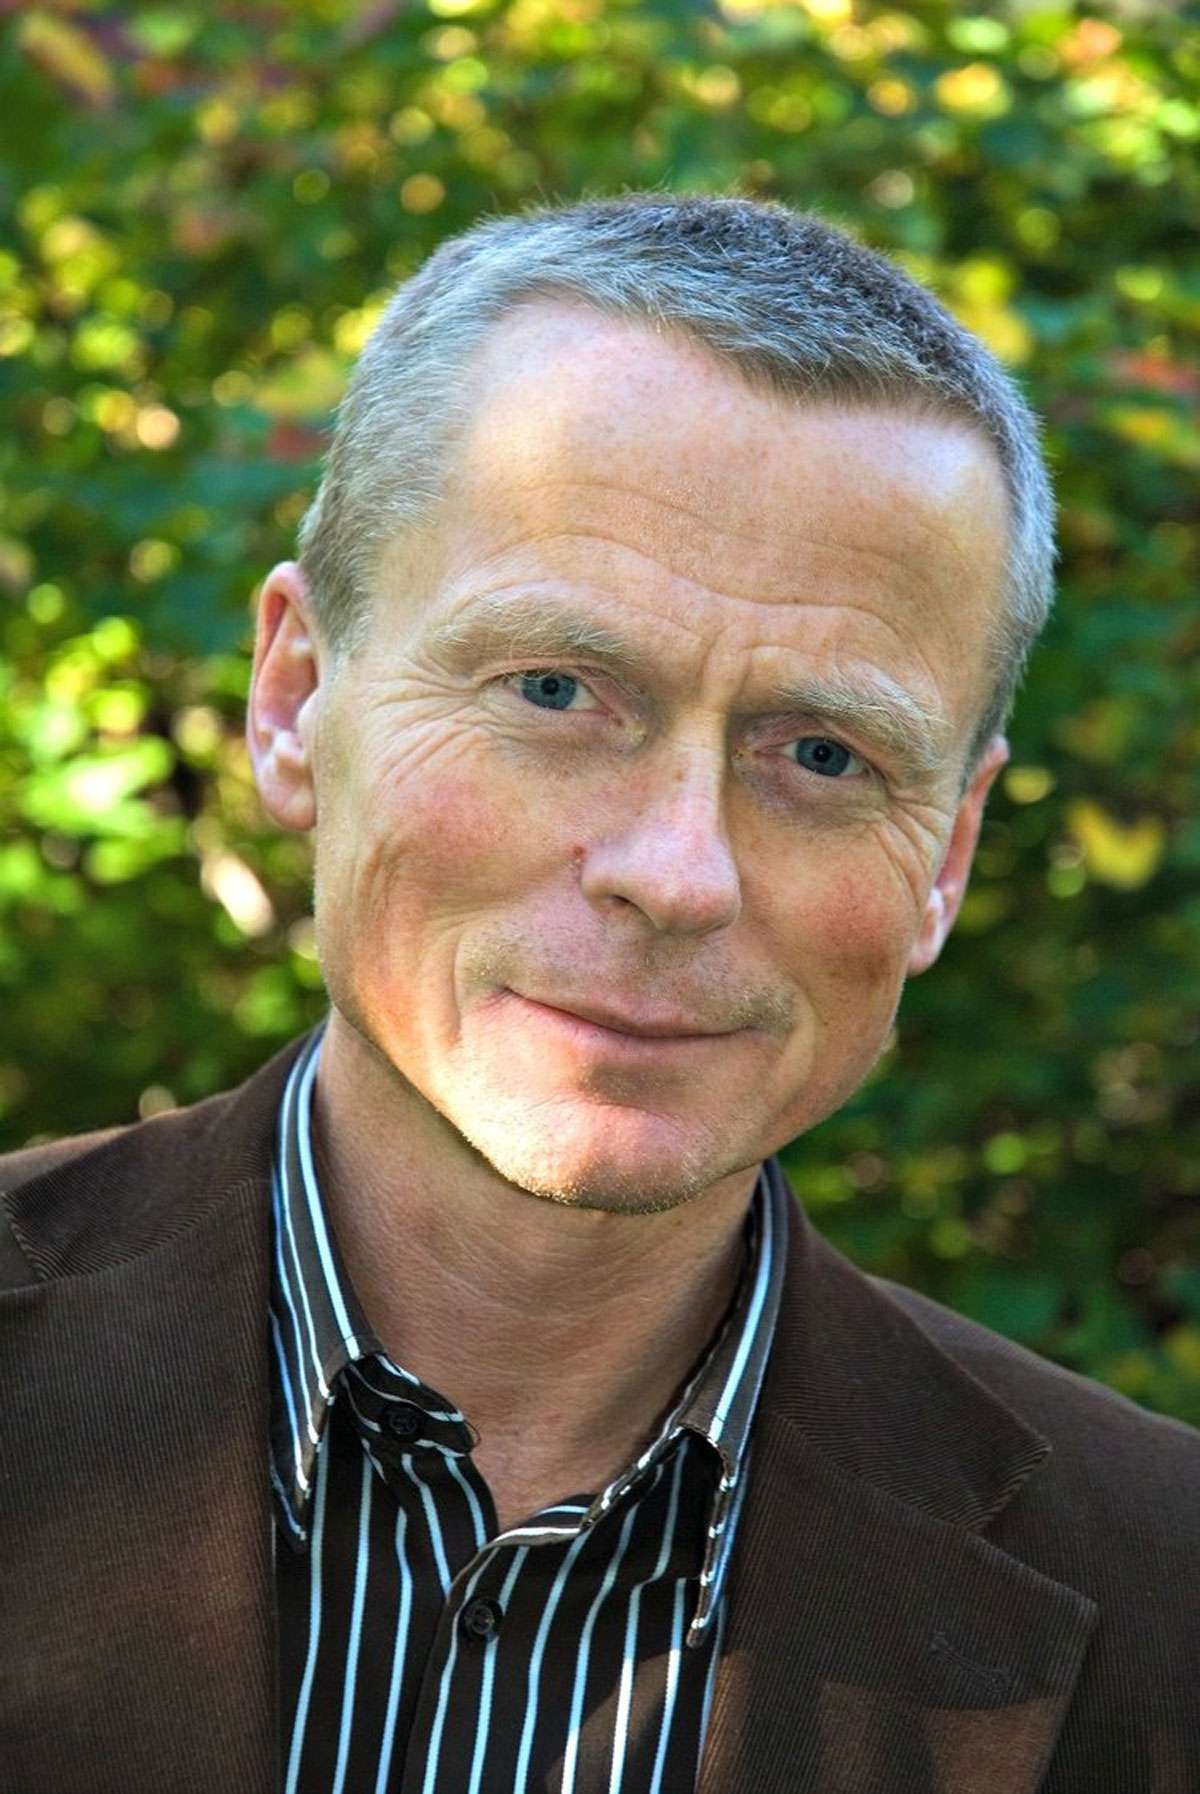 Johan Knutsson, photo by Jessika Wallin